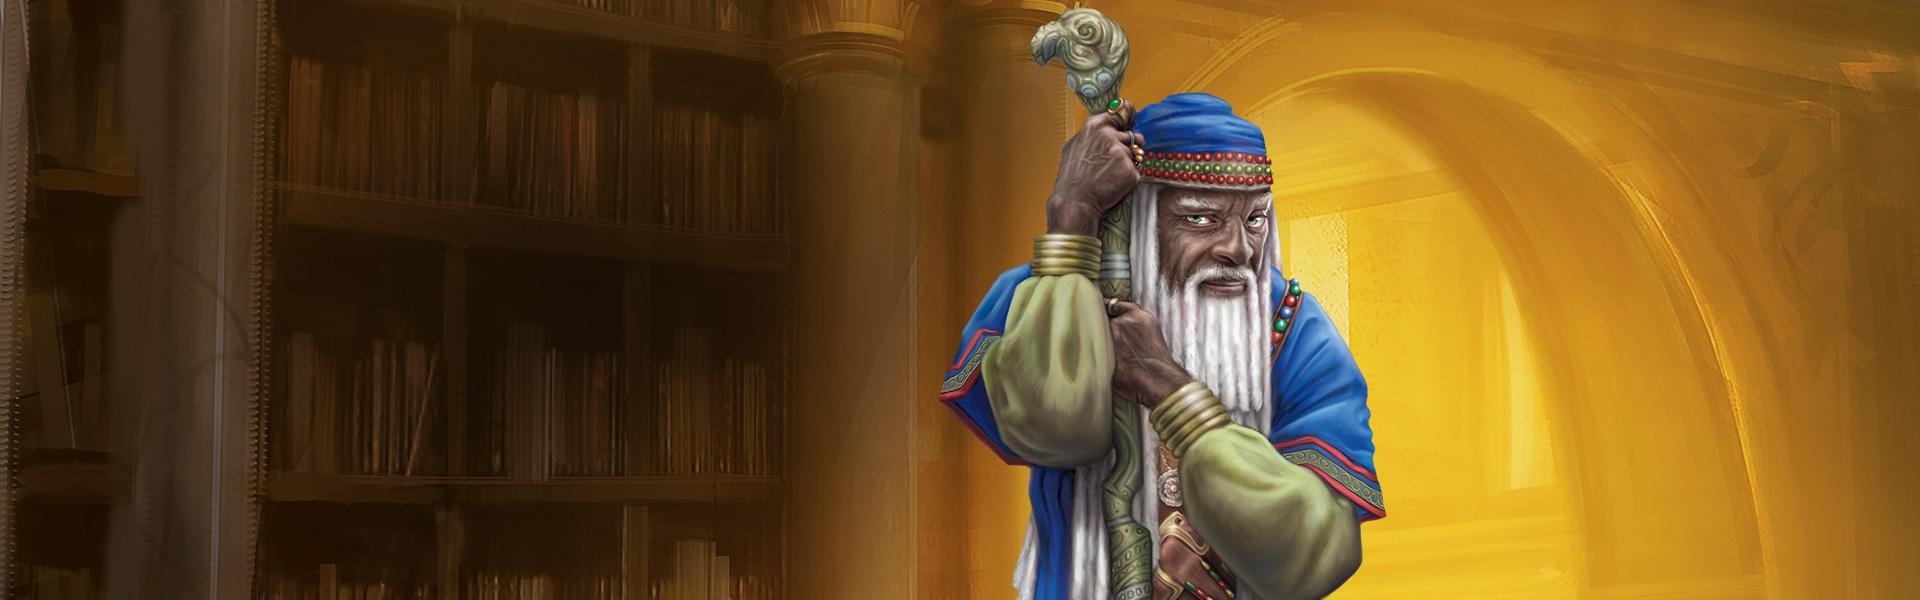 Classes -- Wizard